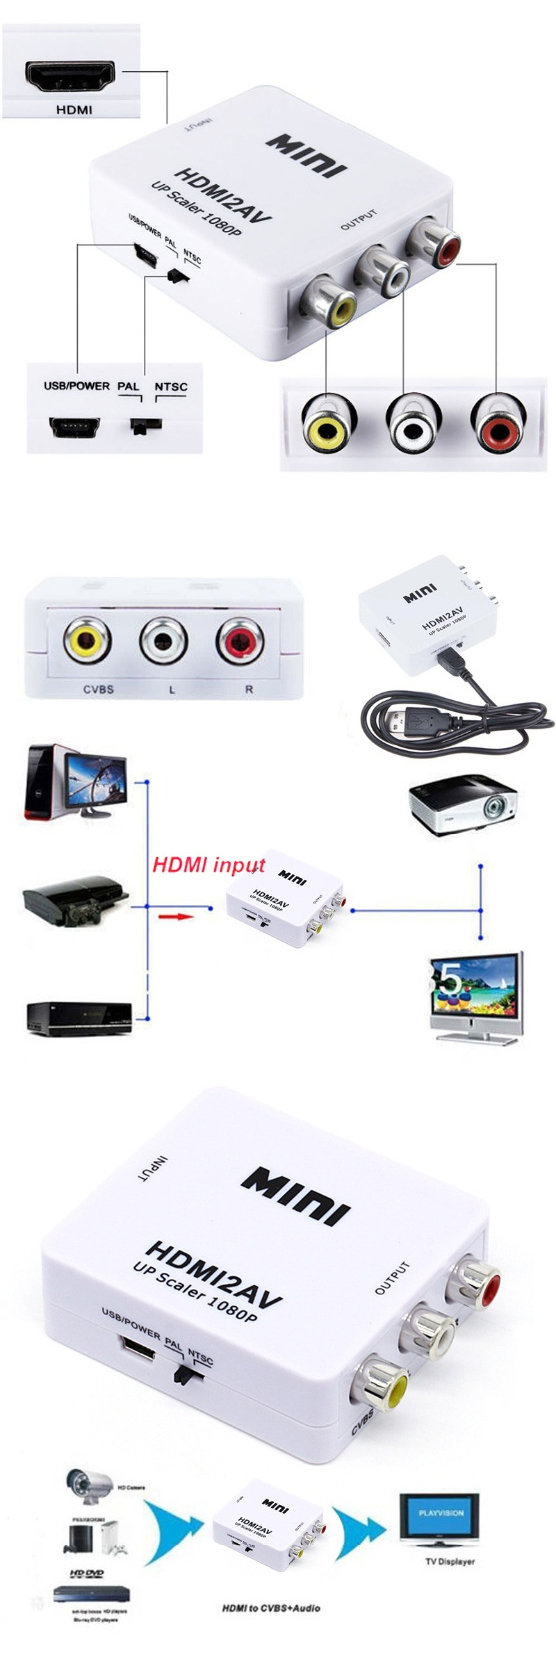 accessoire audi-video - convertisseur hdmi2AV 2